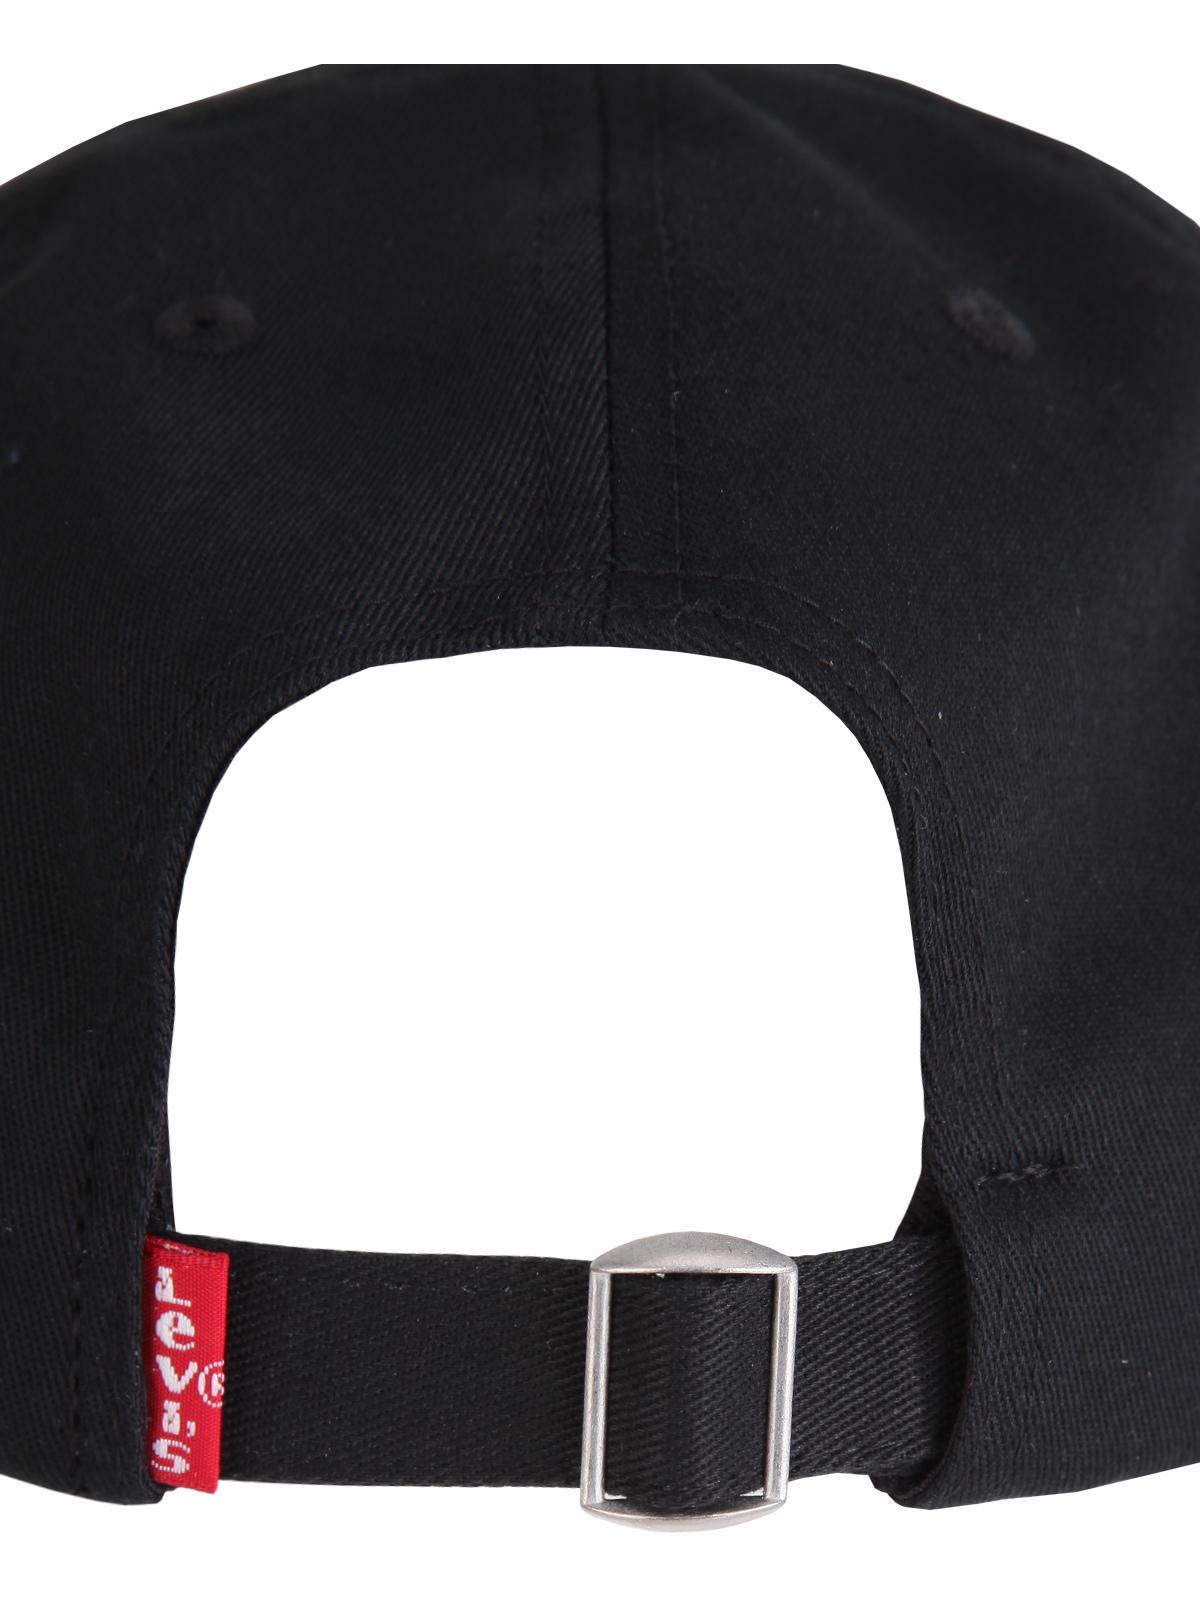 14bff9d2b levi's Black hat with visor - Big Batwing Flex Fit | MecShopping